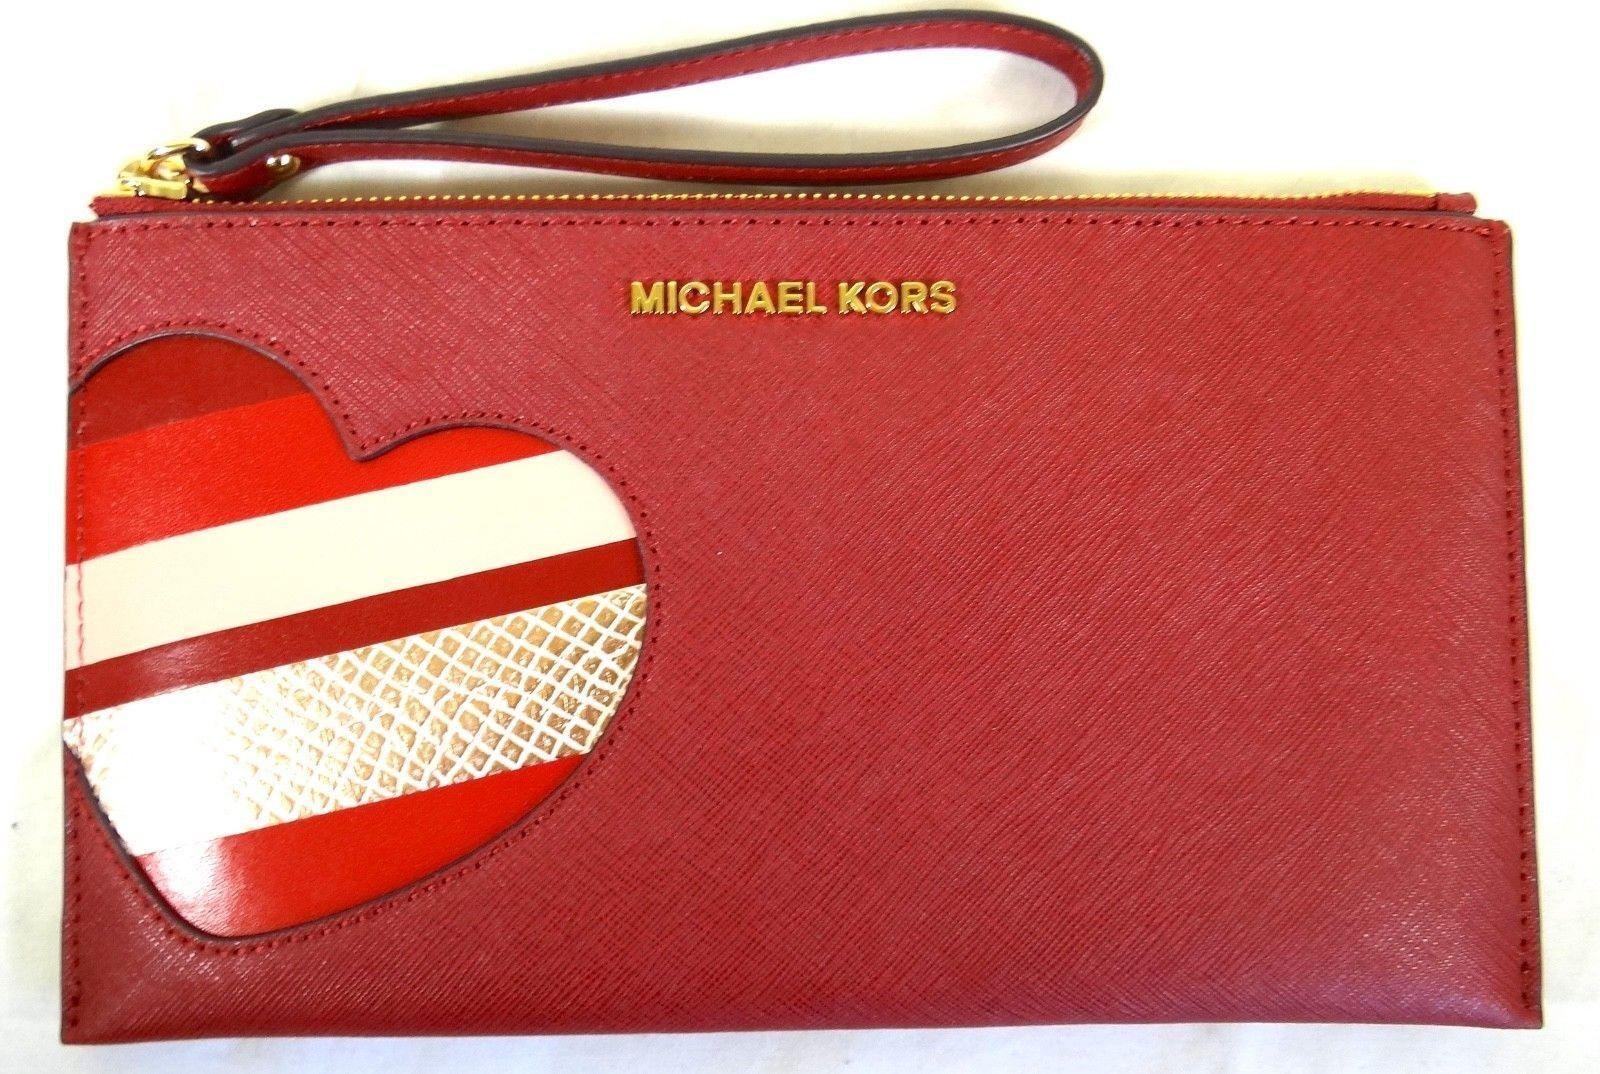 e8f51fb8179 Michael Kors Hearts JST Large Heart Zip Clutch Leather Handbag ...